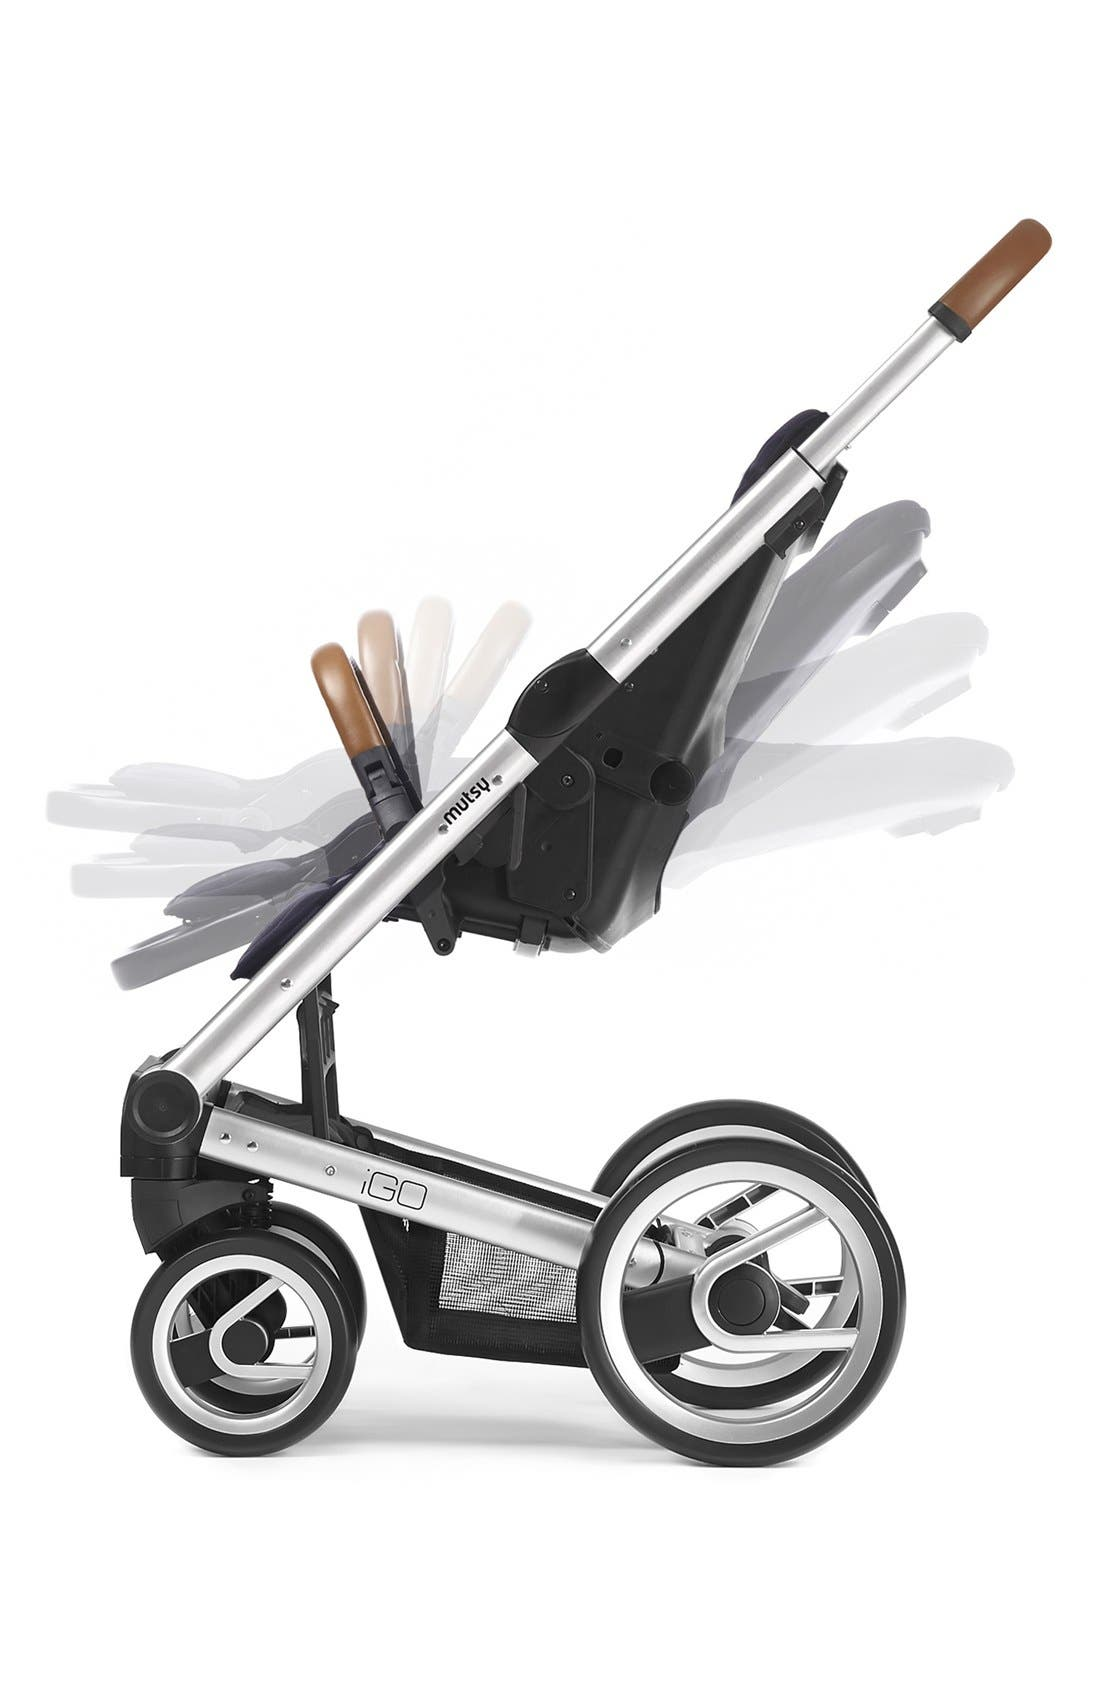 Igo - Urban Nomad Stroller,                             Alternate thumbnail 3, color,                             BLACK/ WHITE/ BLUE